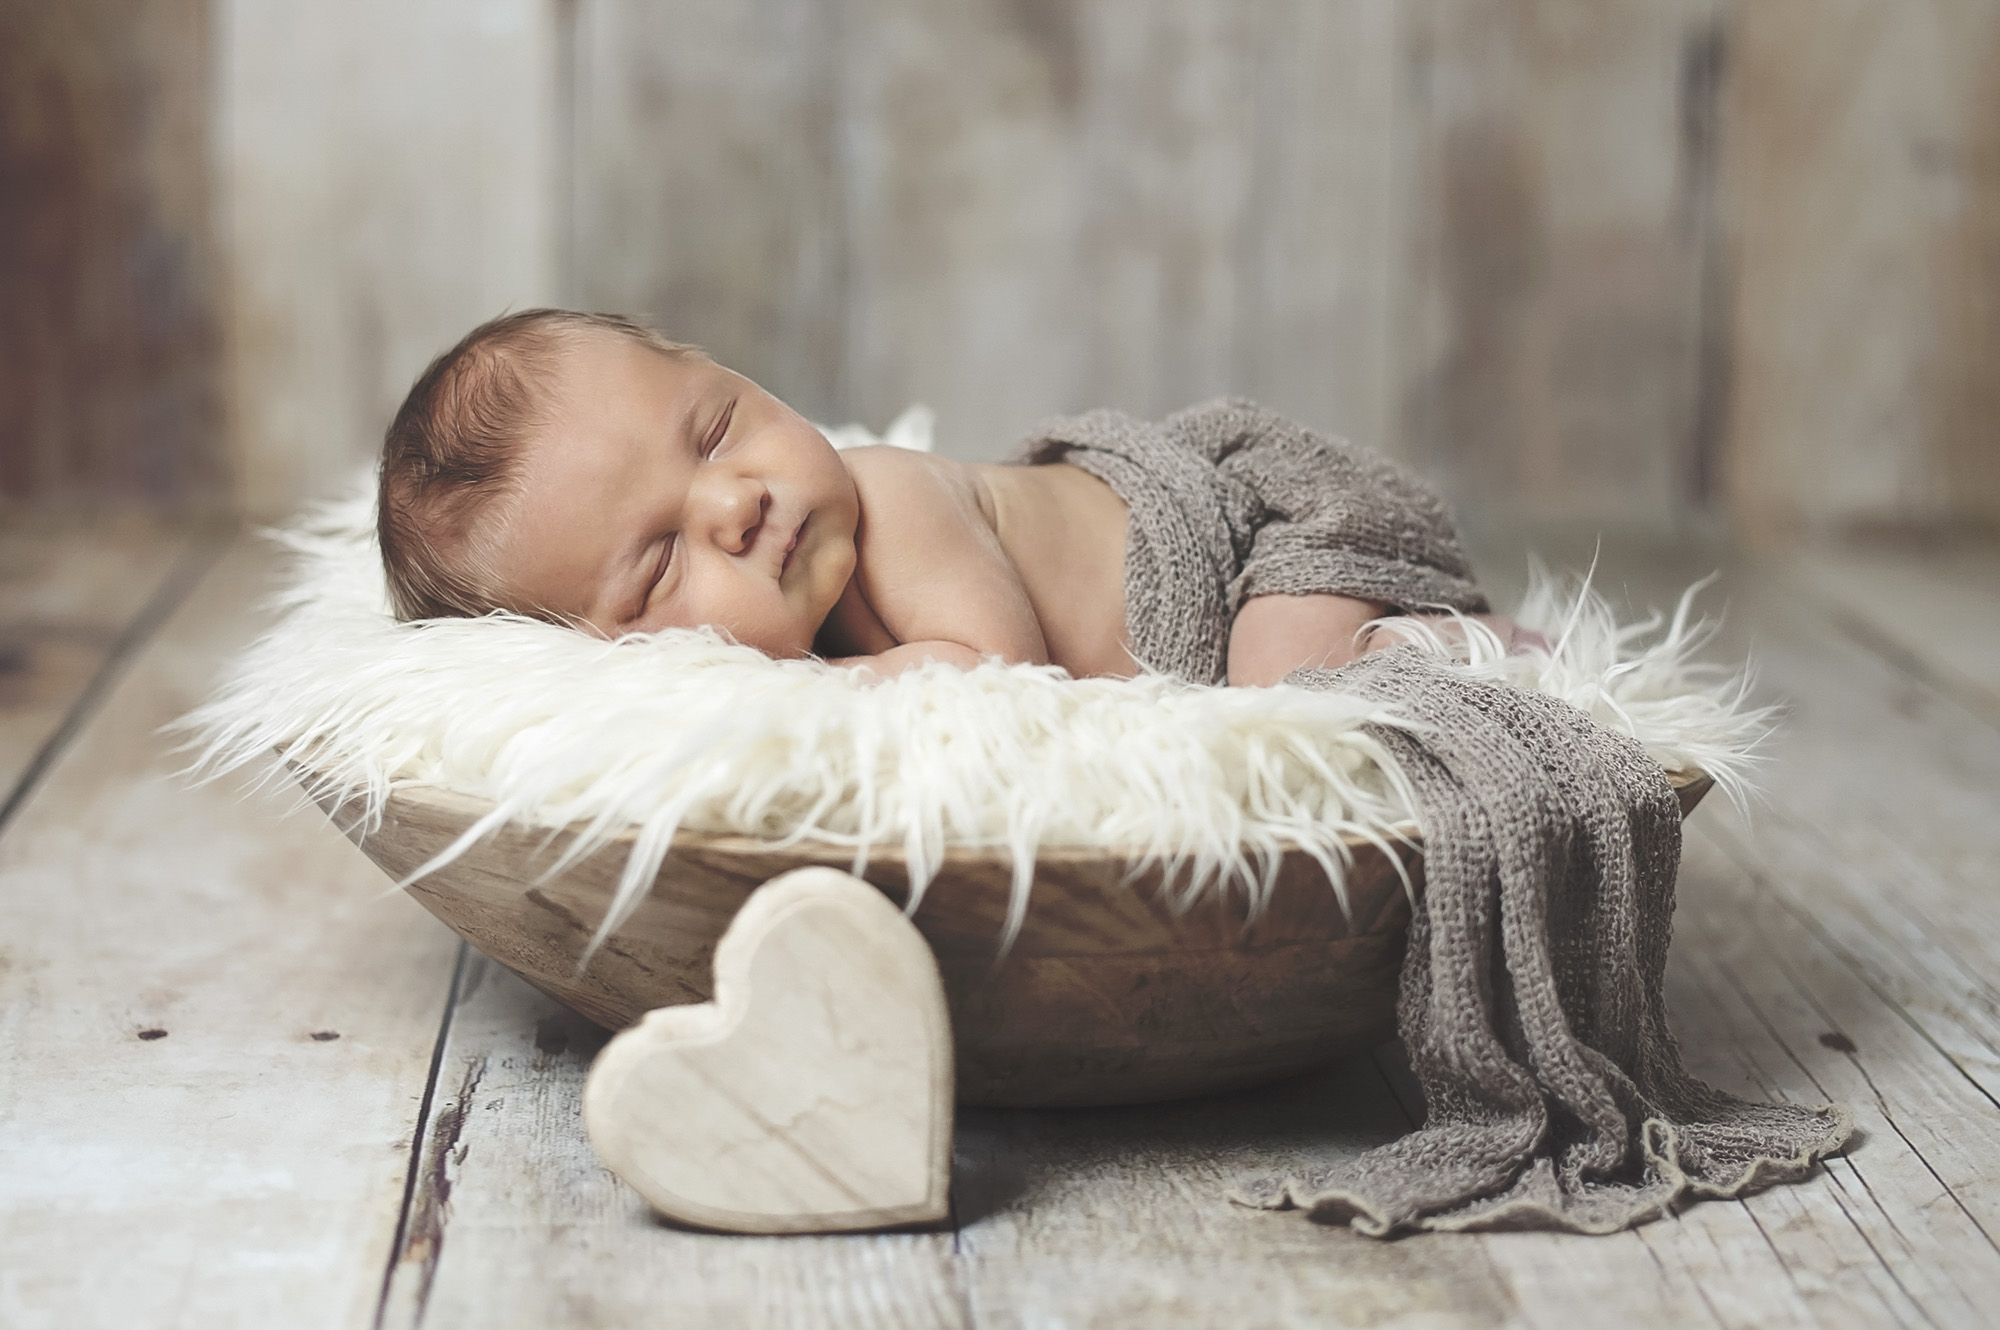 Baby Foto Ideen bildergebnis für baby fotoshooting neugeborene ideen | baby | baby